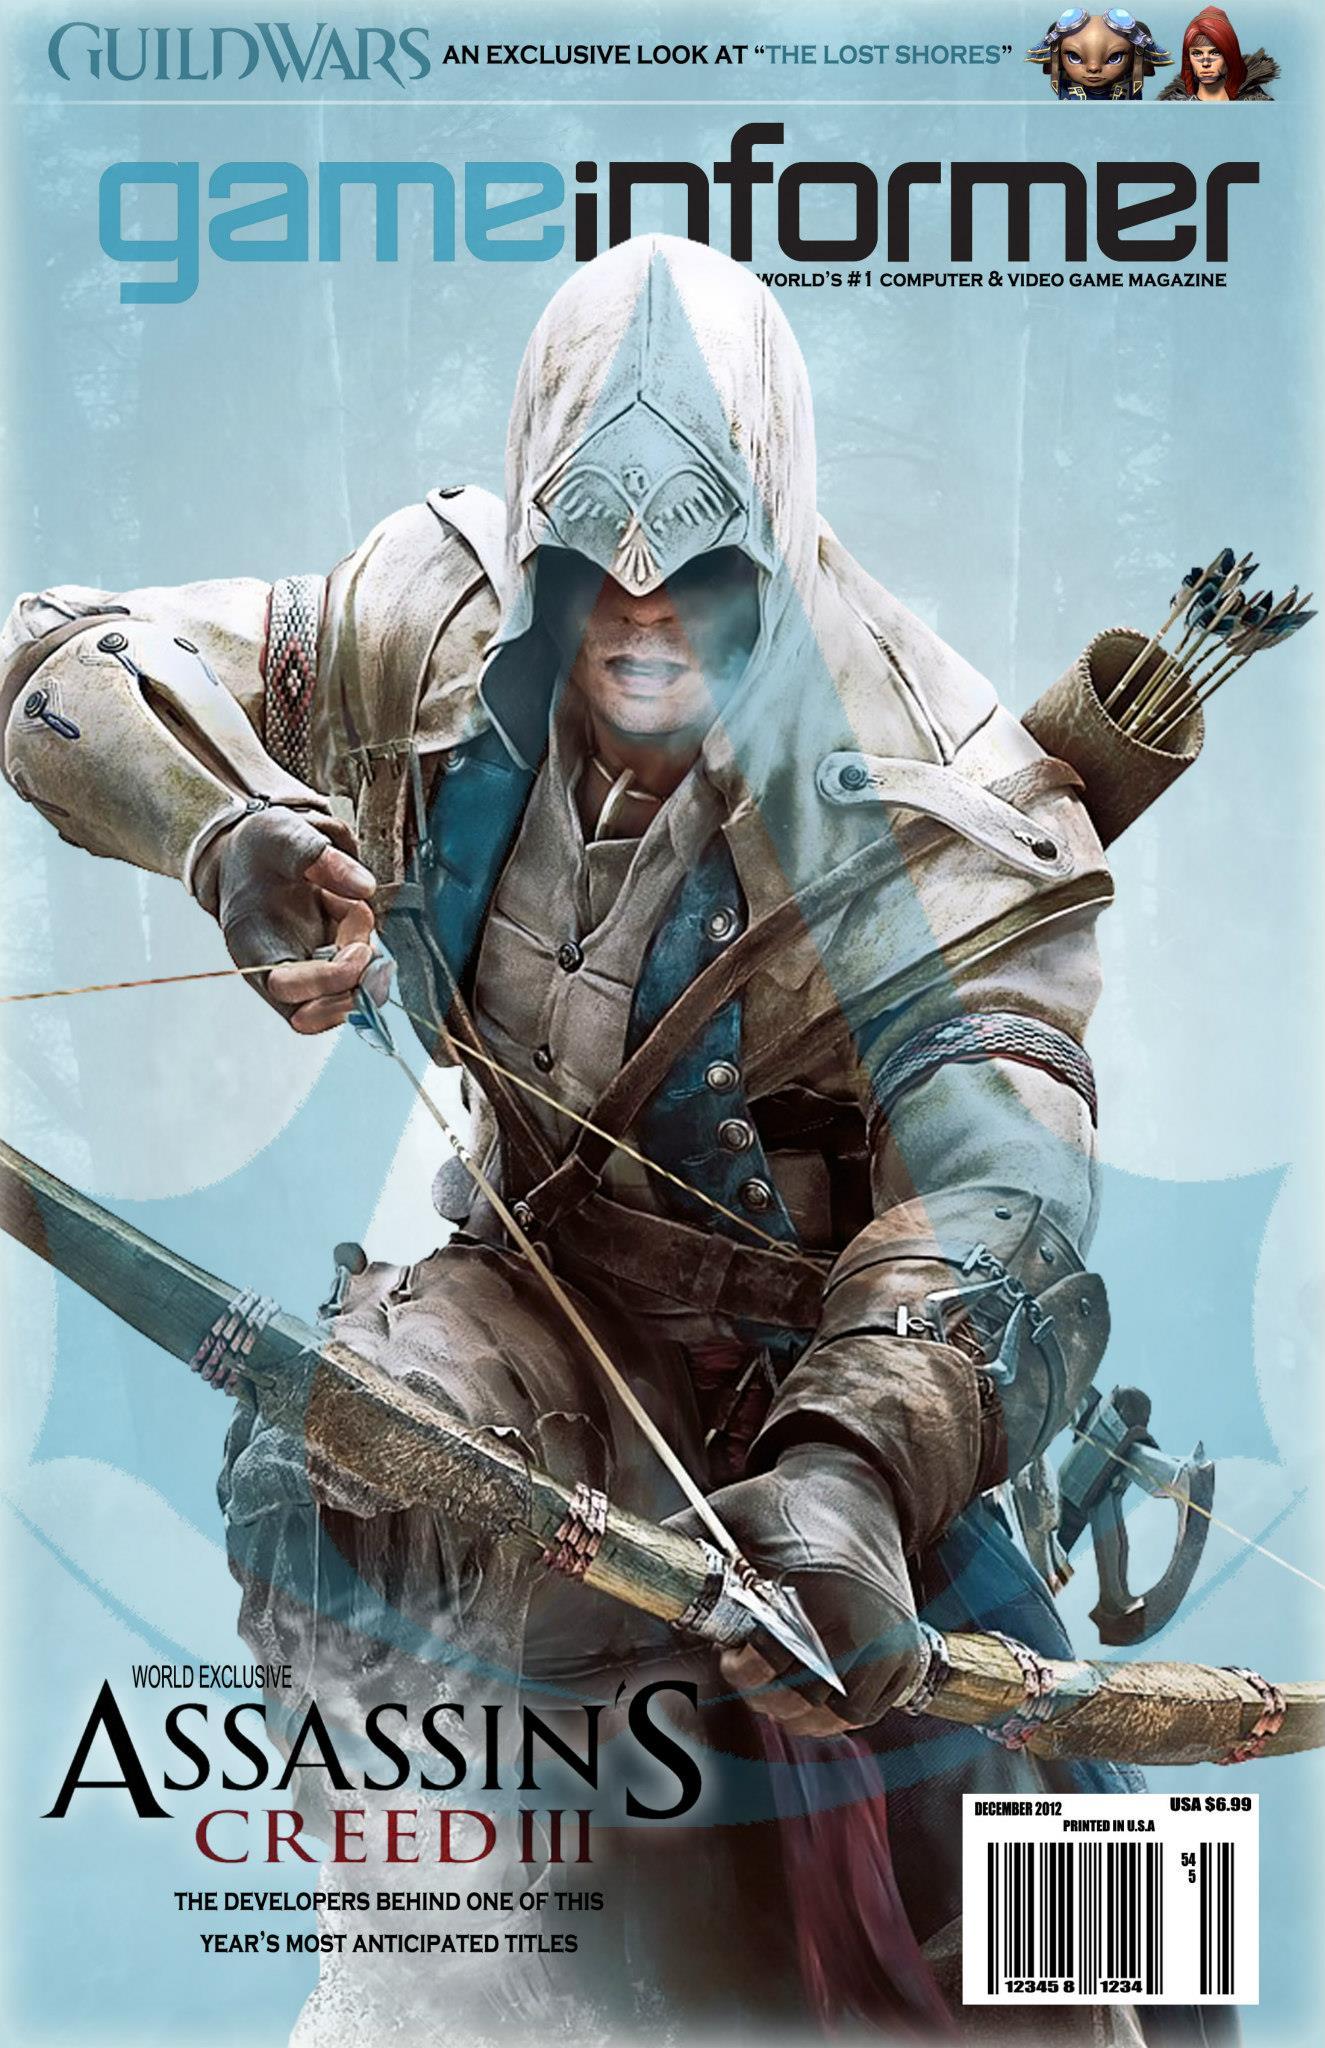 Game Informer Mock Magazine Cover By Kayfriday On Deviantart